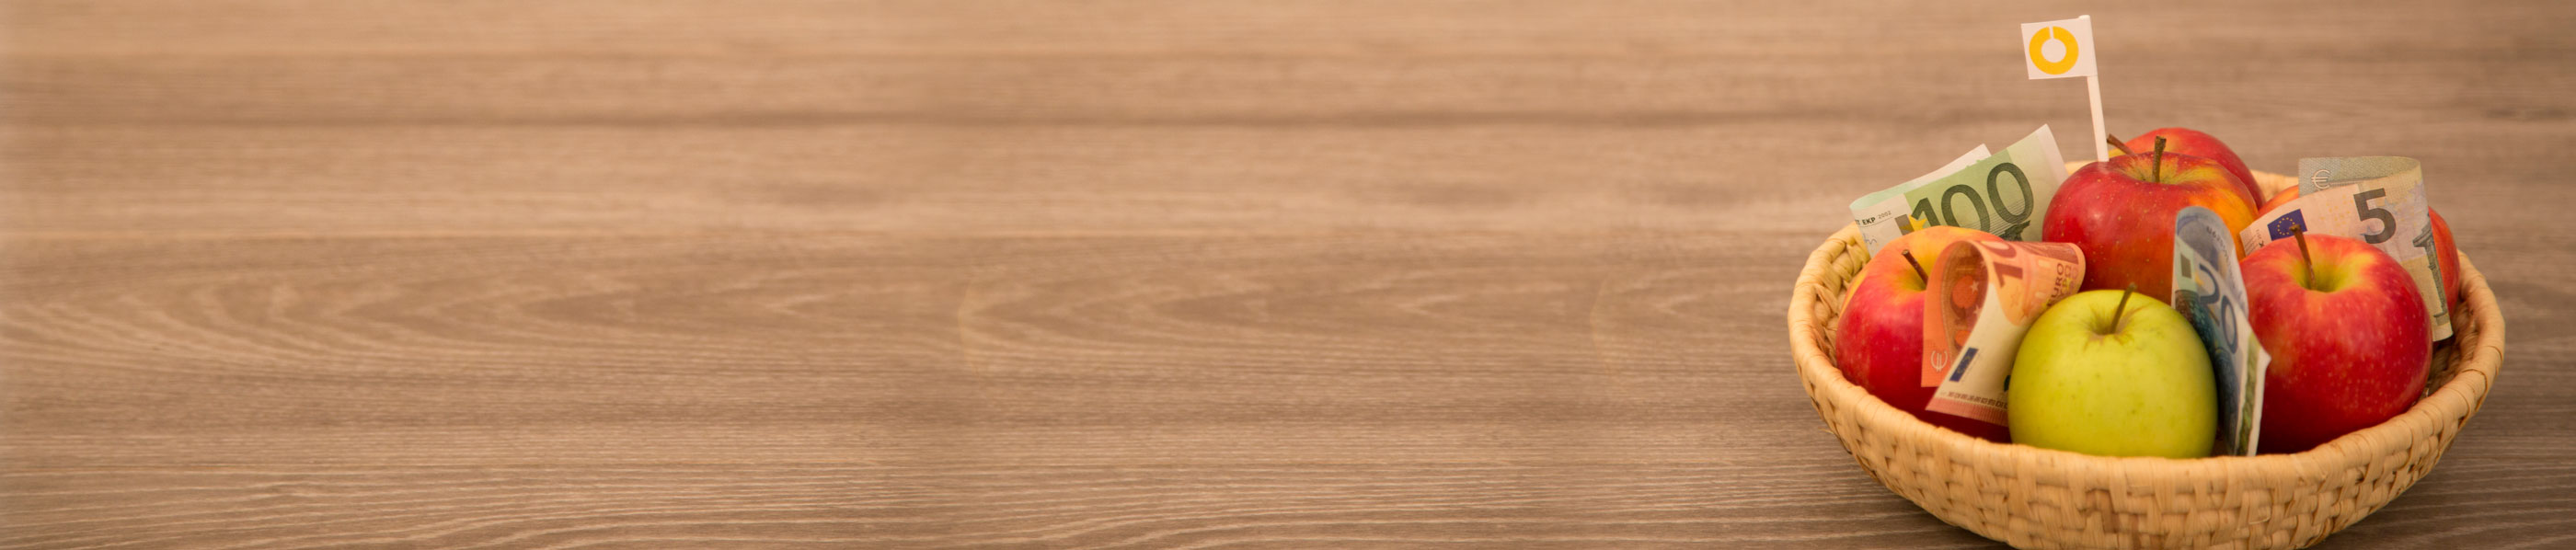 preise faq mactrix mac apple support in wien. Black Bedroom Furniture Sets. Home Design Ideas